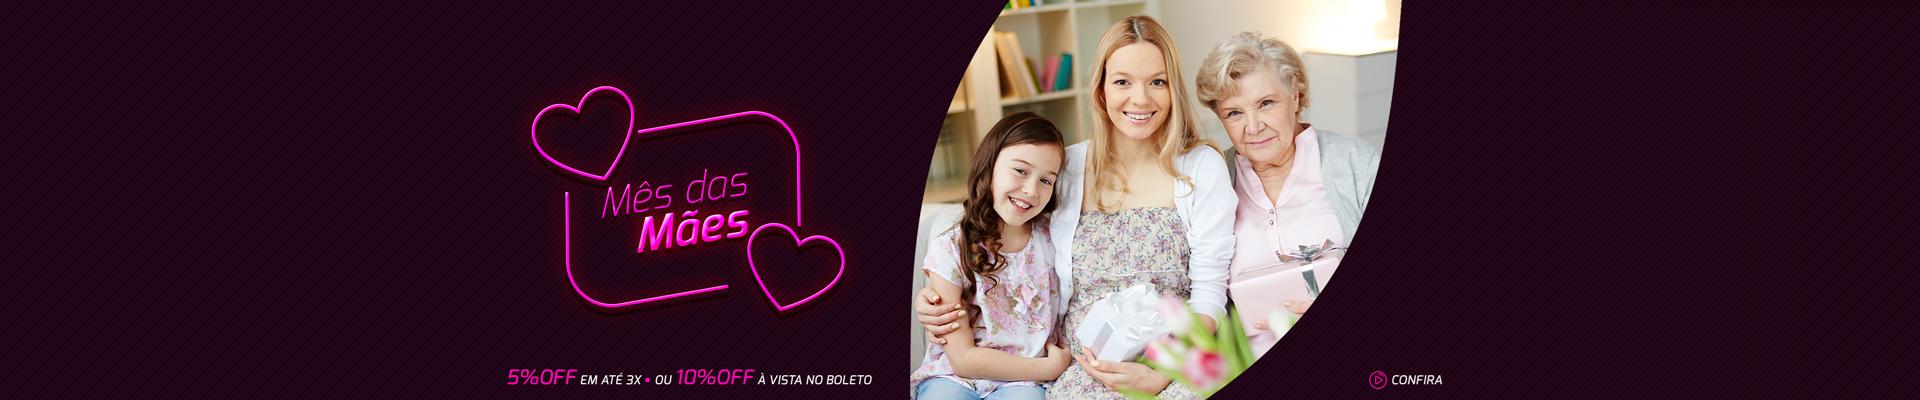 Oferta dia das Mães - Mpozenato Móveis